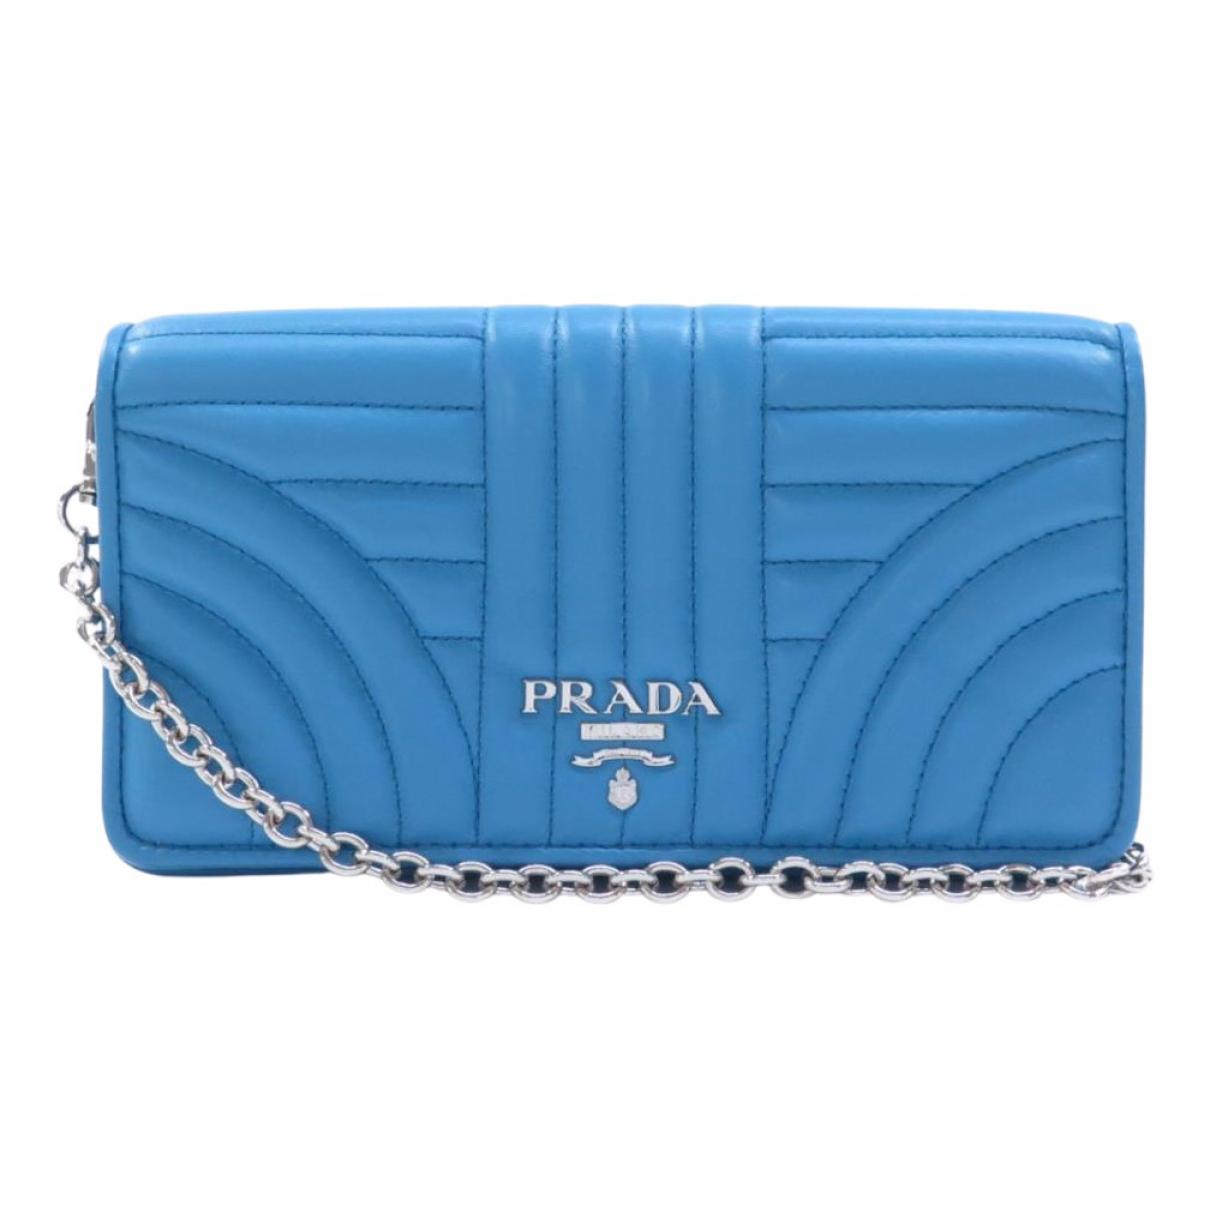 Prada Diagramme Blue Leather Clutch bag for Women N